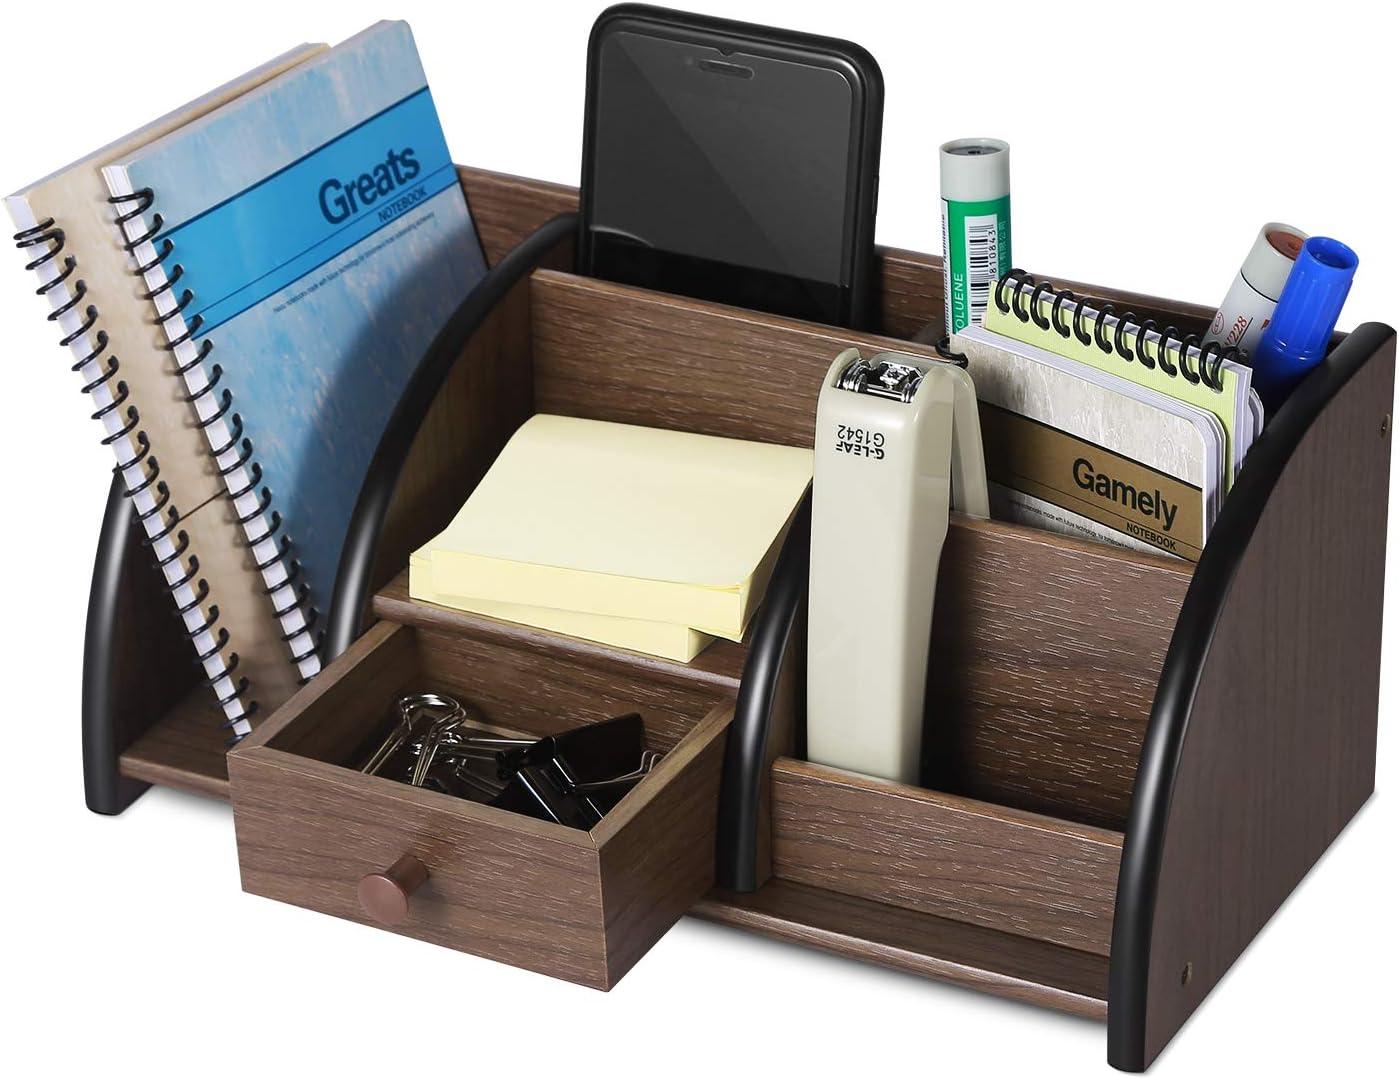 Classic Wood Office Supplies Accessories Desktop Tabletop Sorter Shelf Rack Cherry Brown Pencil Holder Caddy Set 6 Compartments Flexzion Wooden Desk Organizer w//Drawer /& Book End